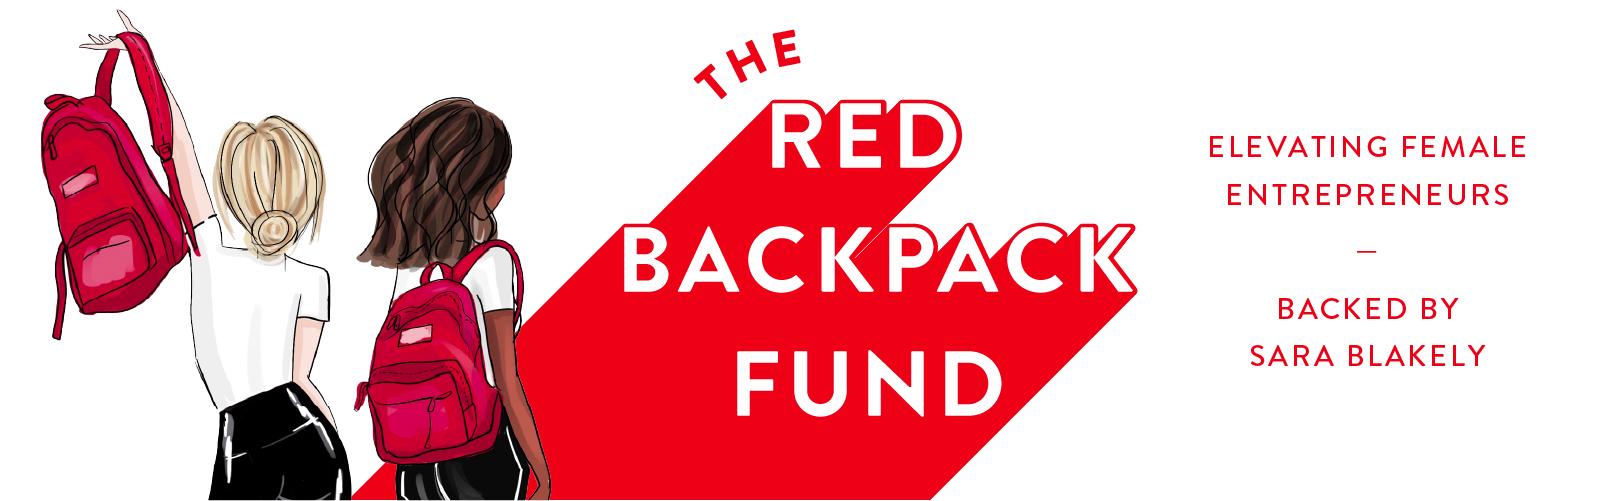 Spanx by Sara Blakely Red Backpack Fund